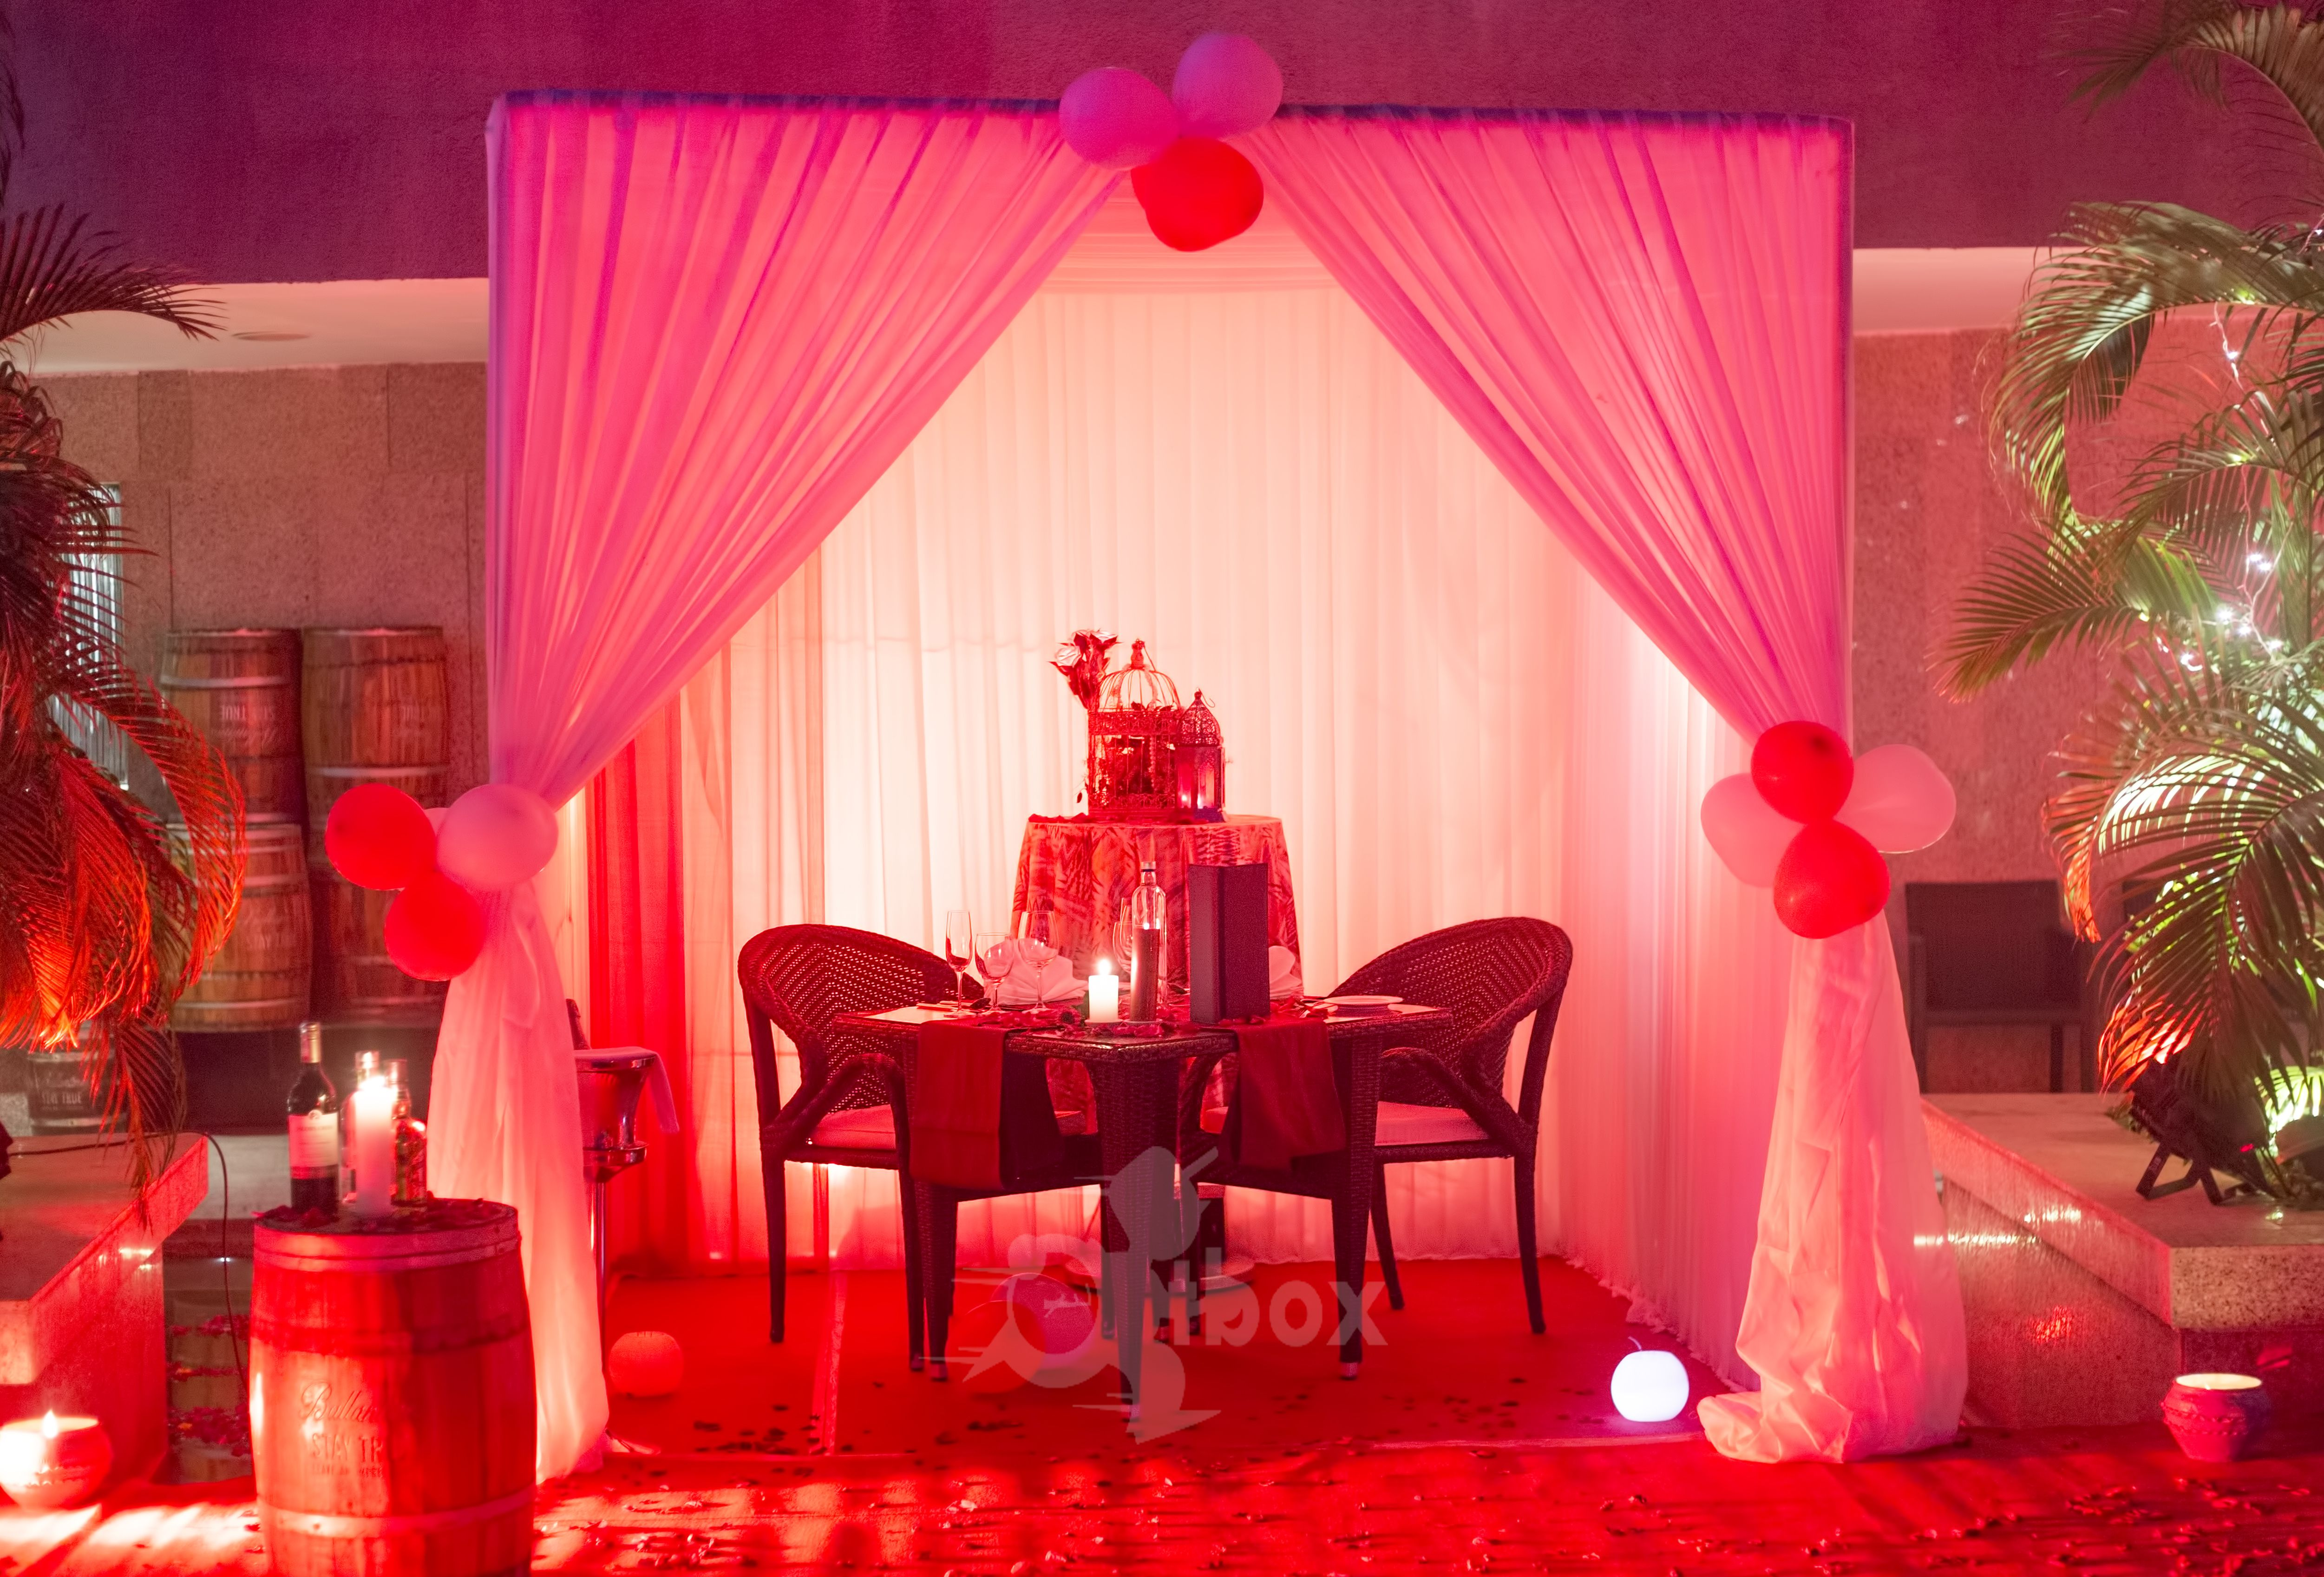 Cabana setup for a romantic date night romantic dates